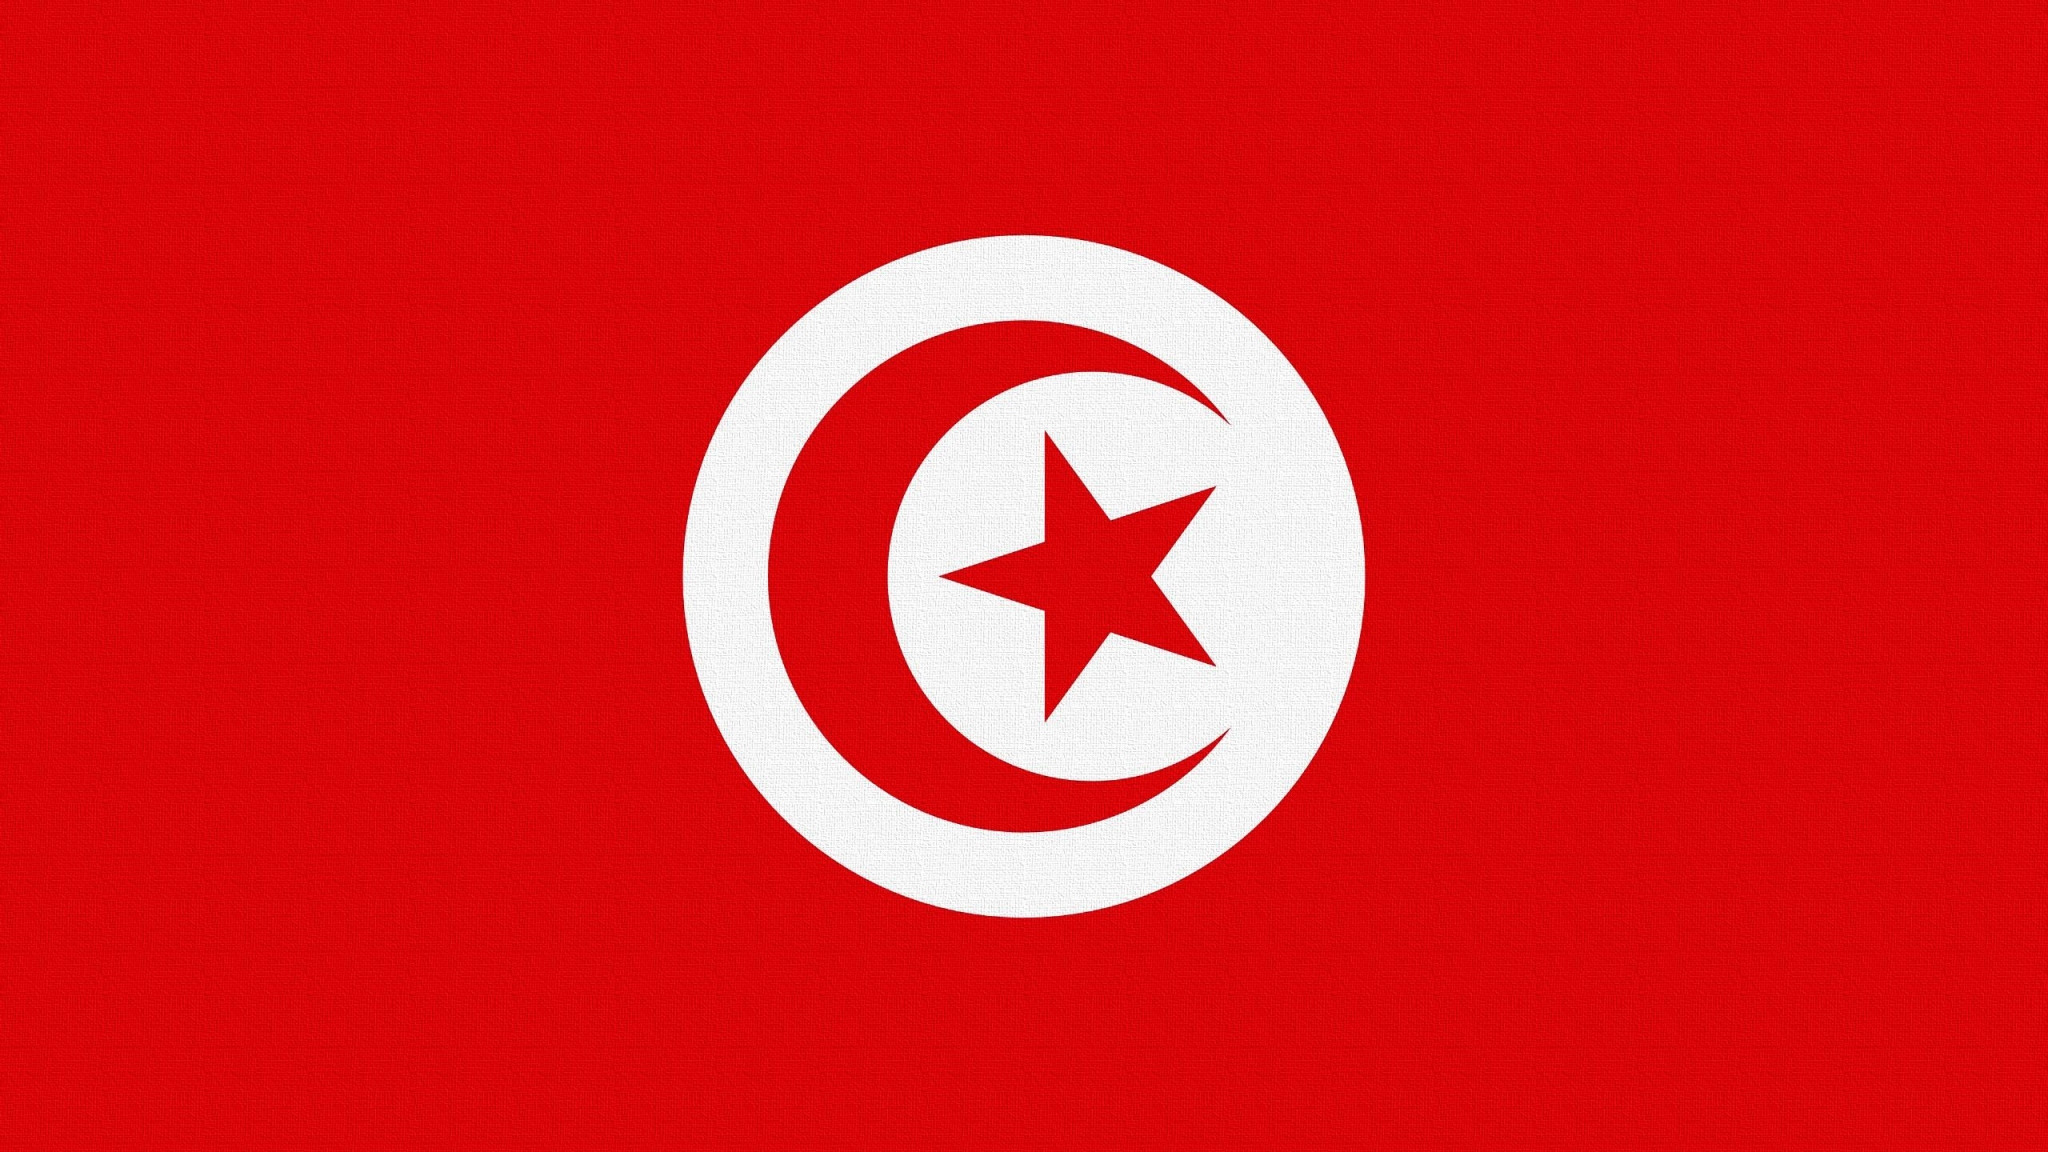 wallpaper tunisia flag star HD Widescreen High Definition 2048x1152